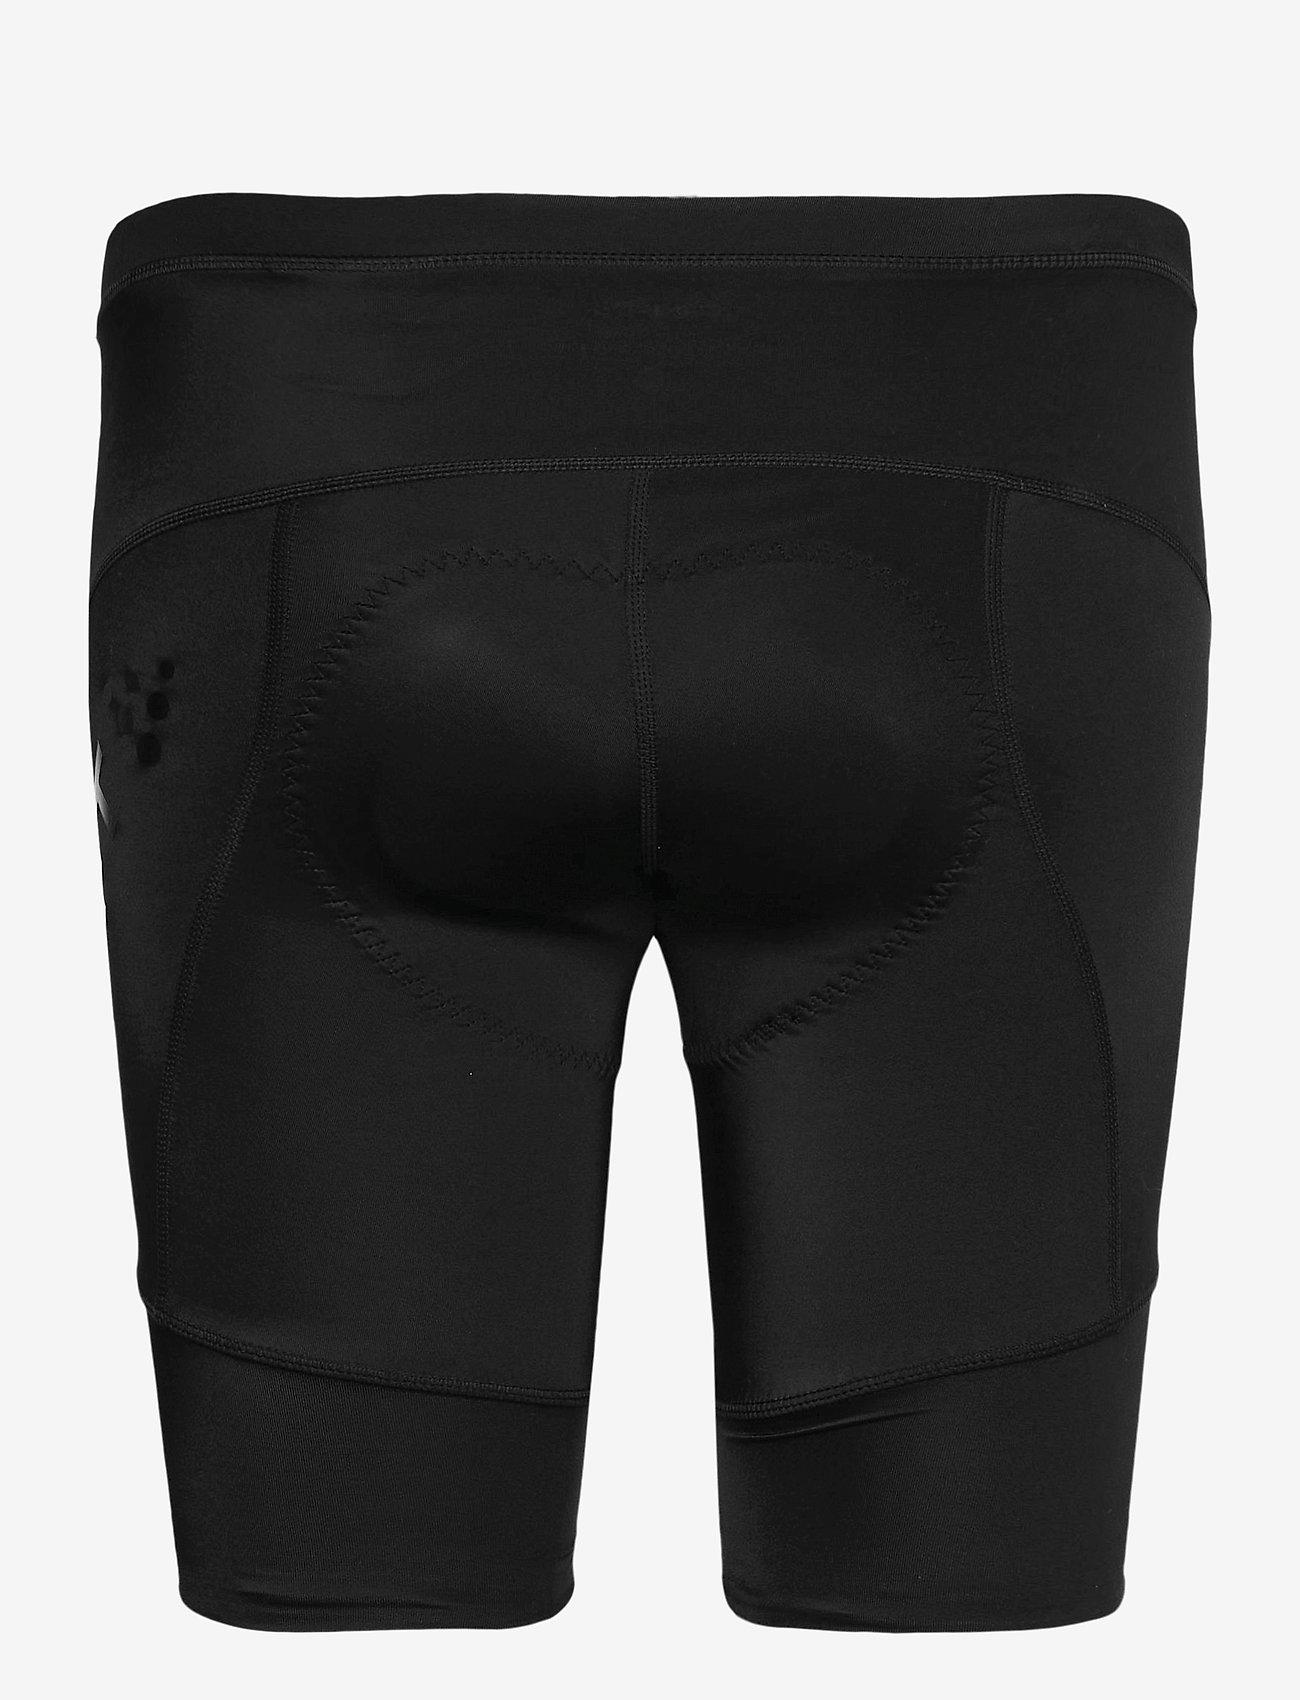 Craft - Essence Shorts W - sykkelshorts og tights - black - 1